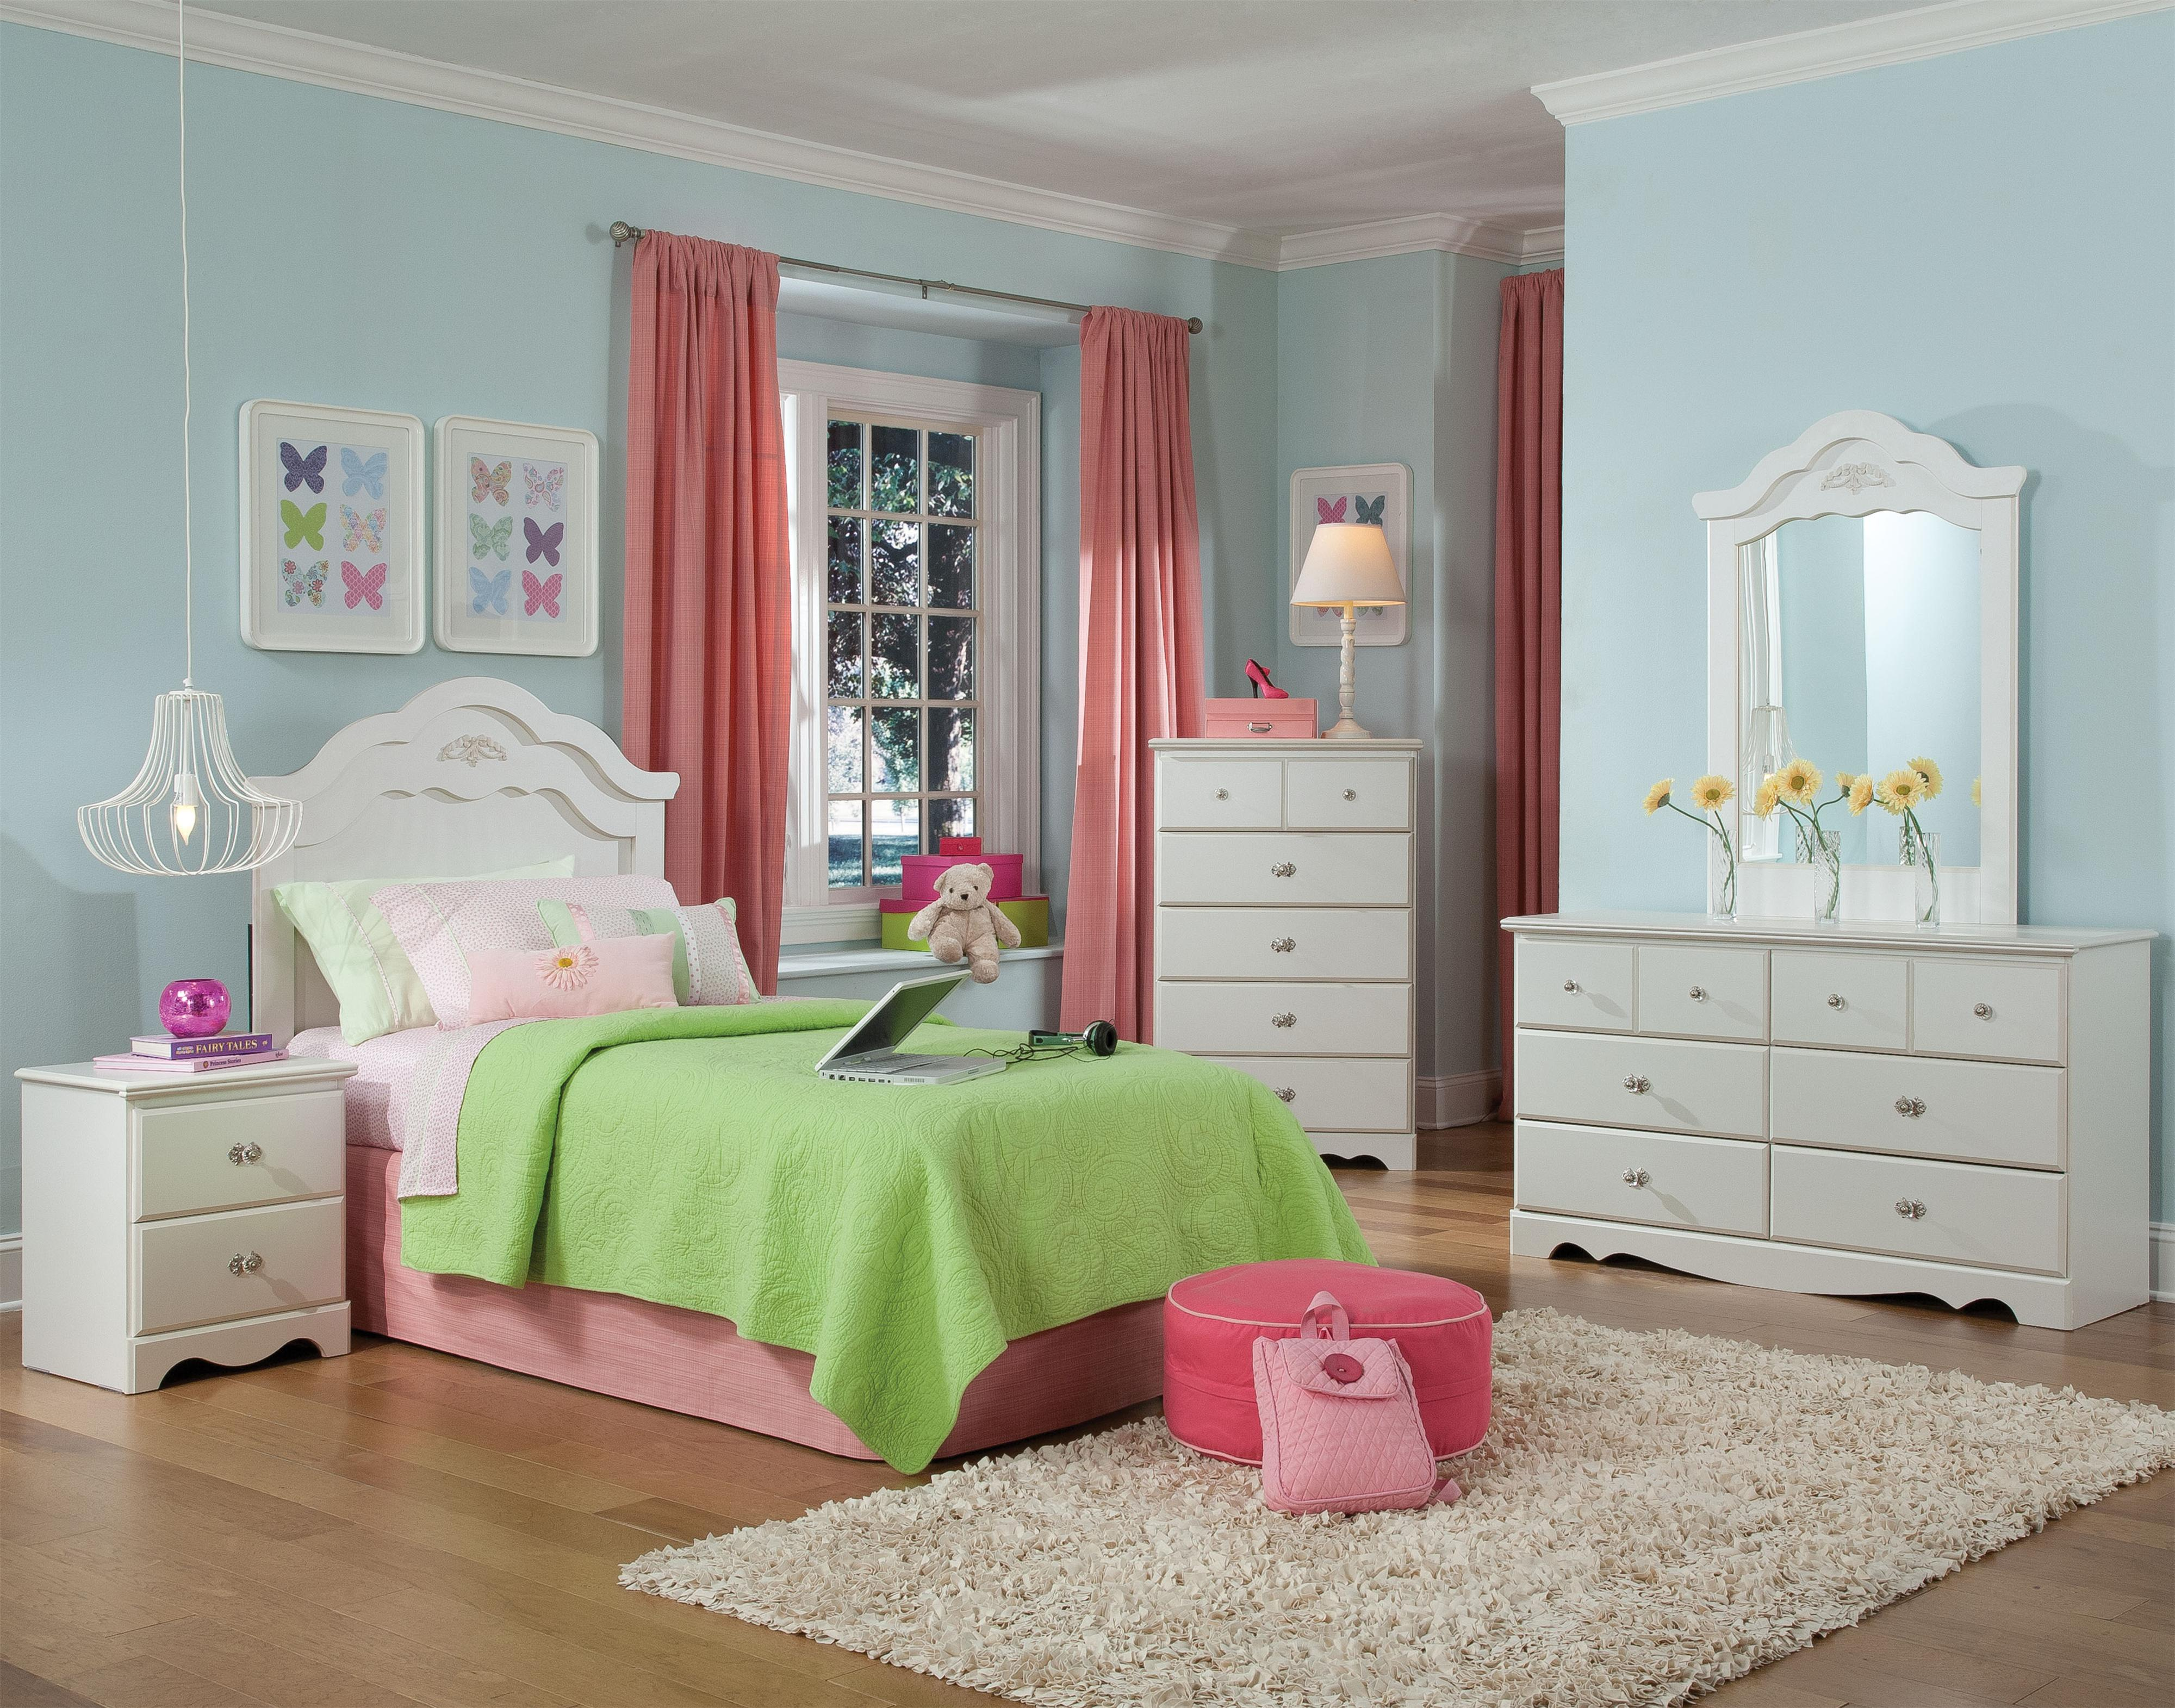 Standard Furniture Daphne Twin Bedroom Group - Item Number: 65550 T Bedroom Group 1